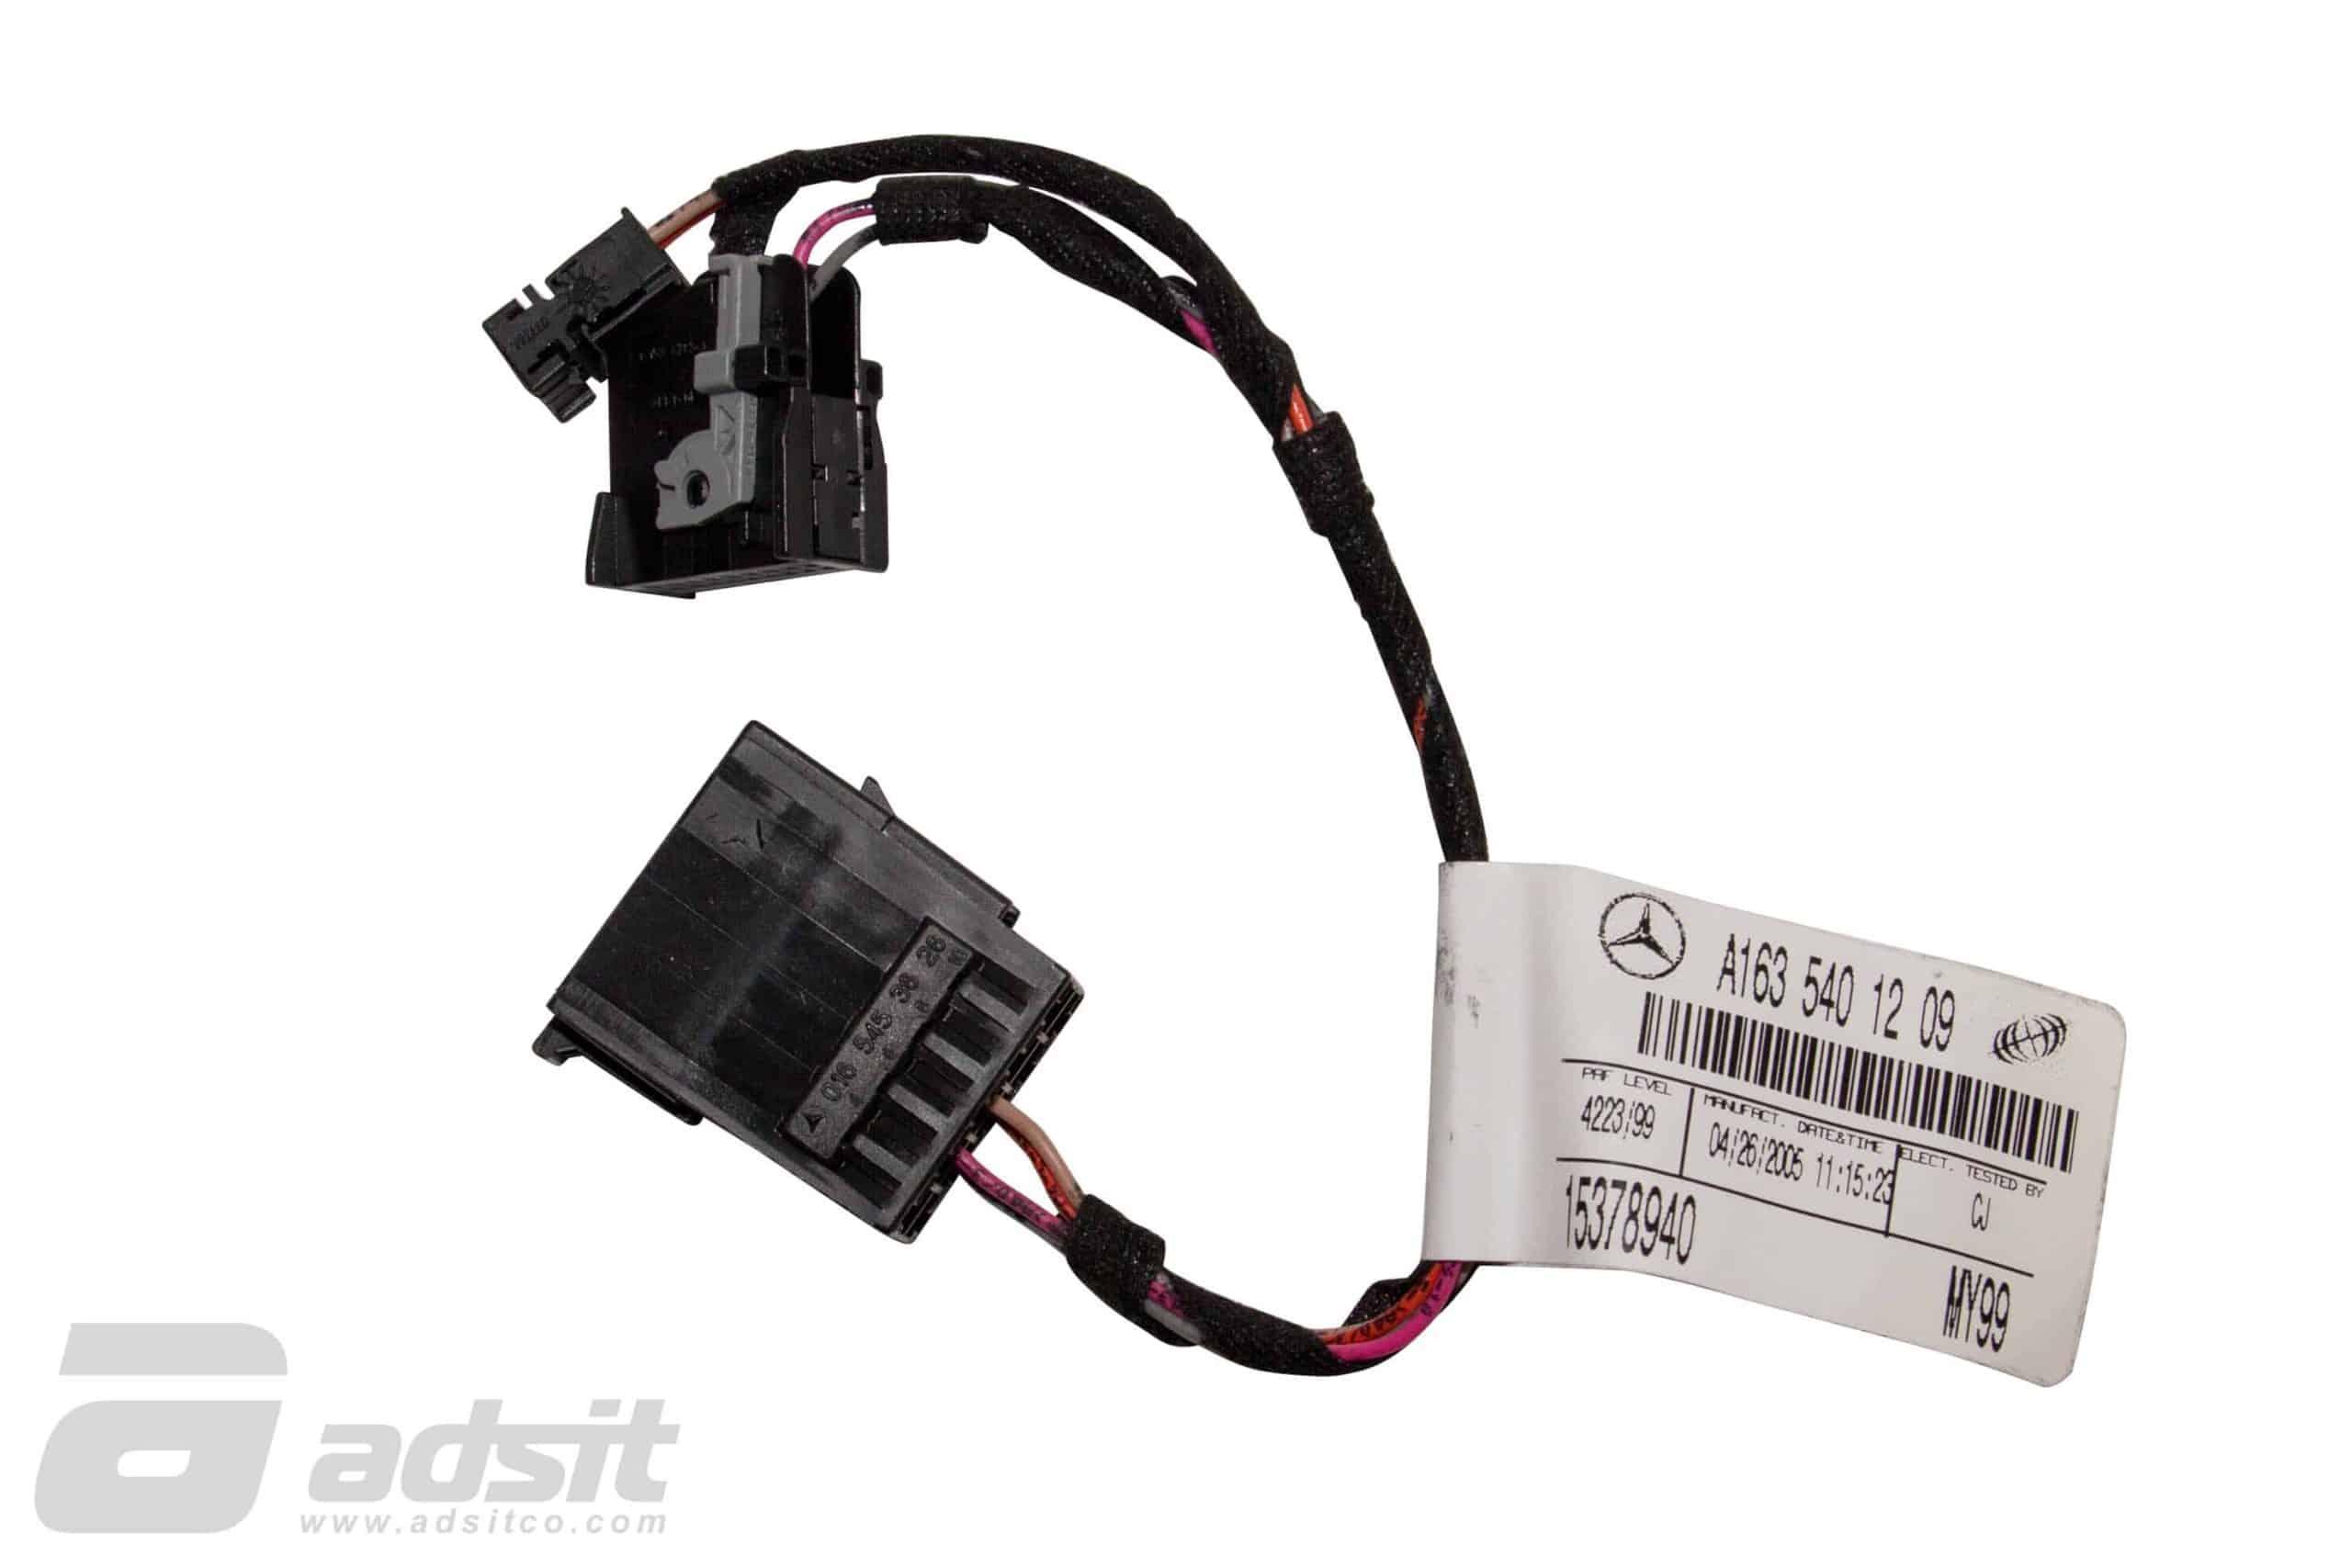 Radio Set Cable Harness